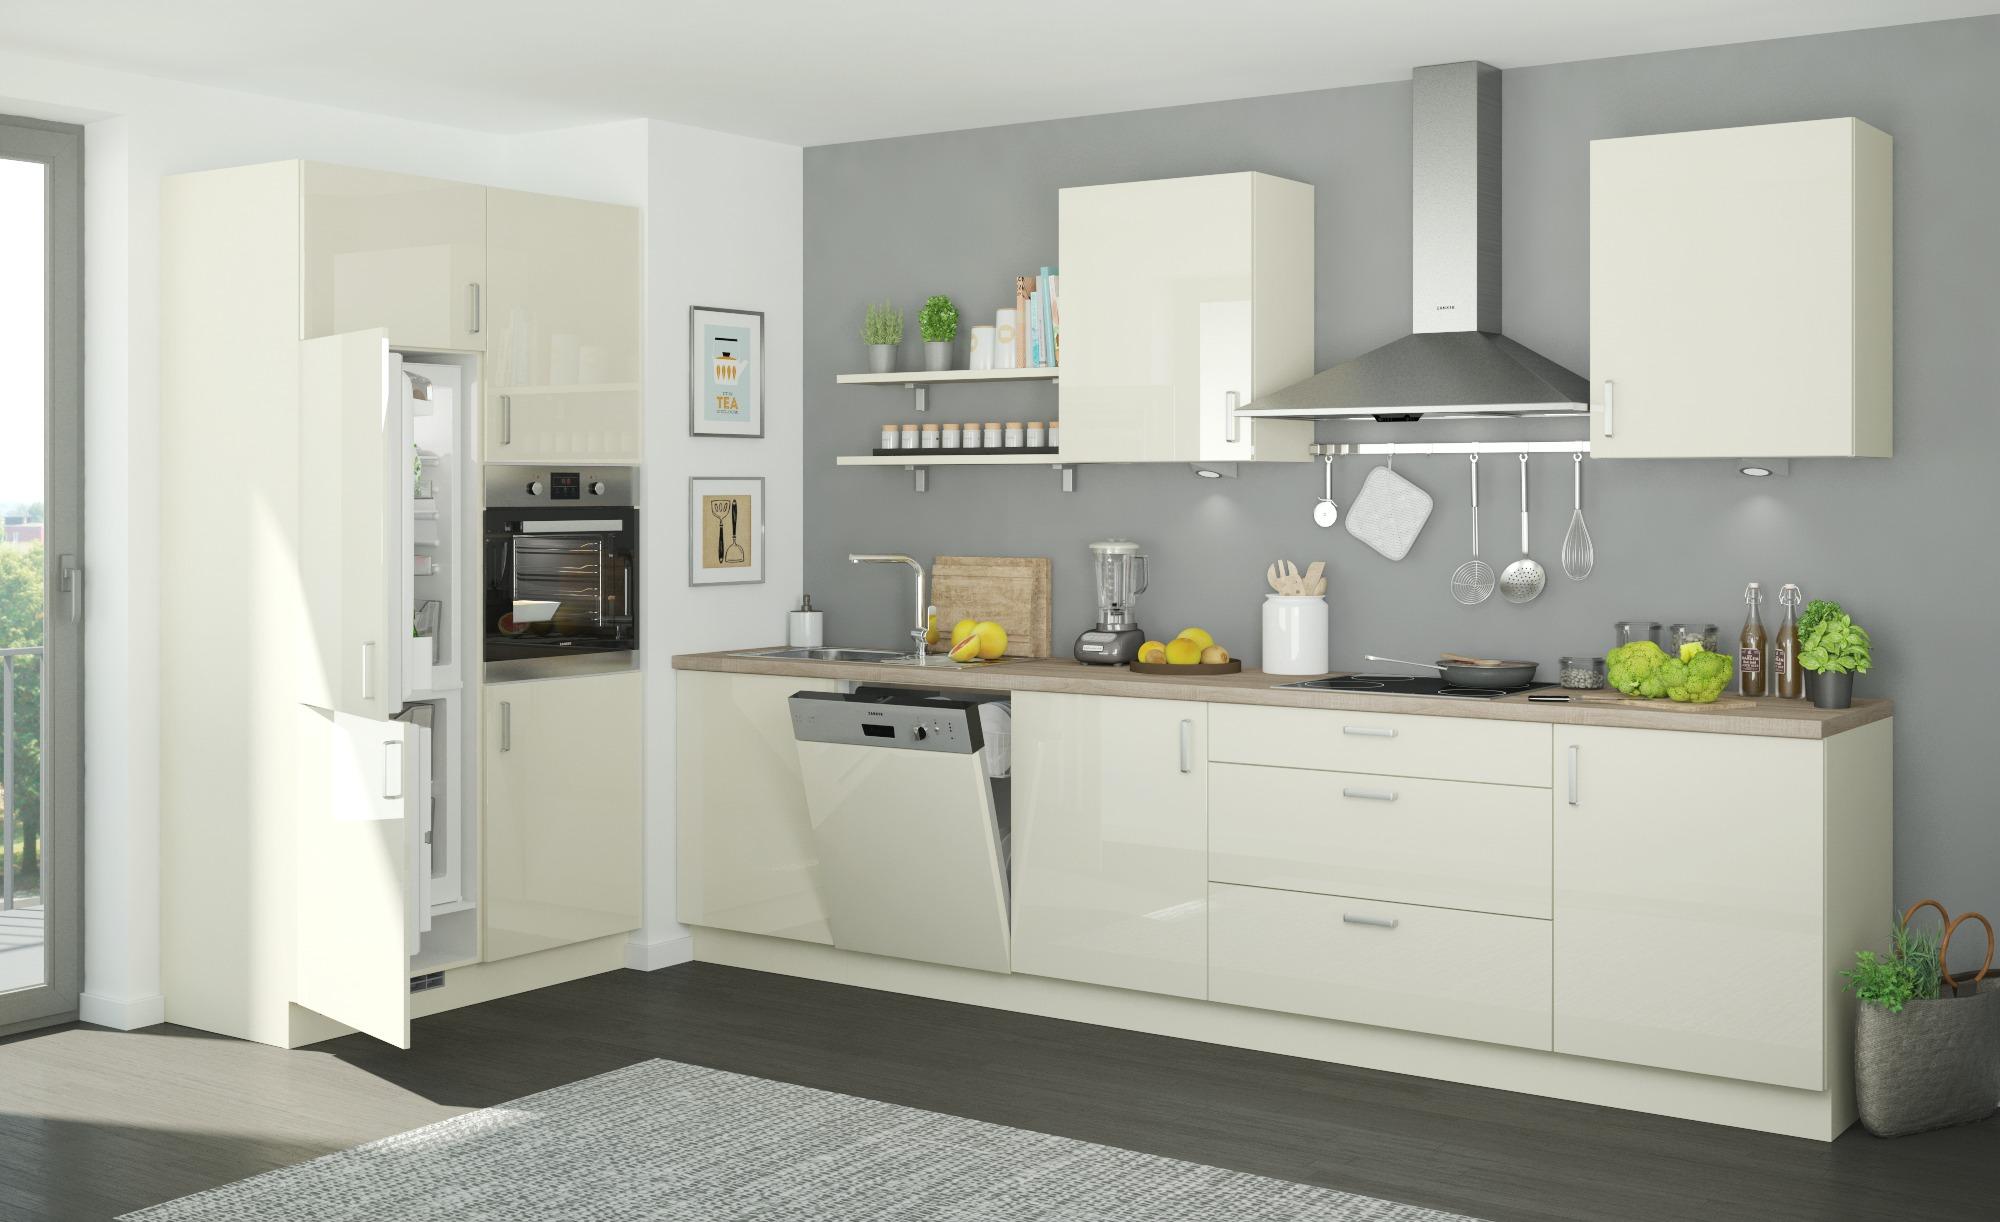 Full Size of Küche Ohne Elektrogeräte Küche Ohne Elektrogeräte Kaufen Neue Küche Ohne Elektrogeräte Sinnvoll Küche Ohne Elektrogeräte Gebraucht Küche Küche Ohne Elektrogeräte